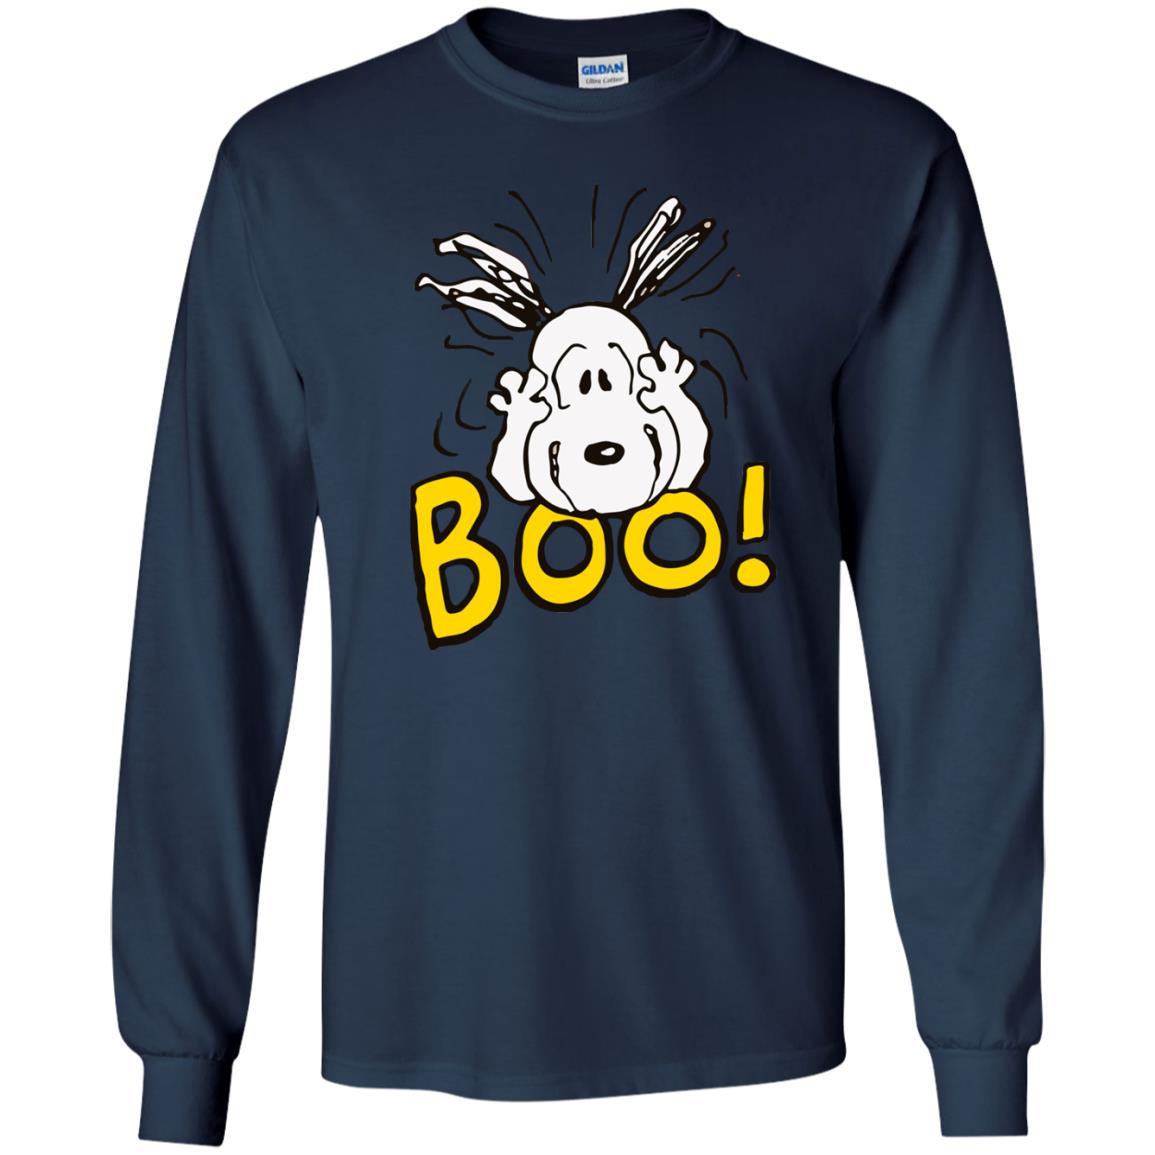 image 2229 - Peanuts Snoopy Halloween Boo shirt, hoodie, tank